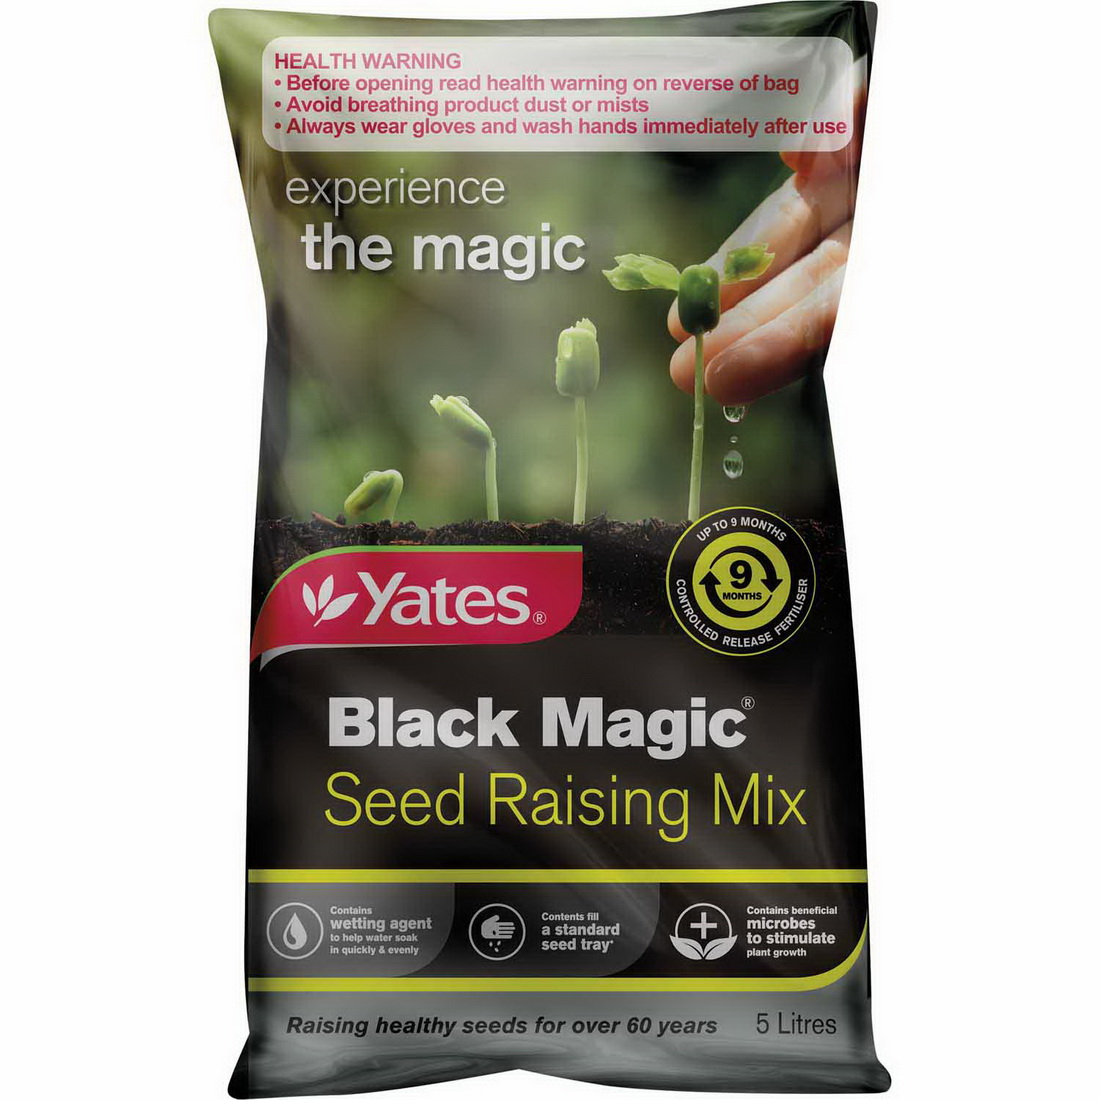 Black Magic 5L Seed Raising Mix